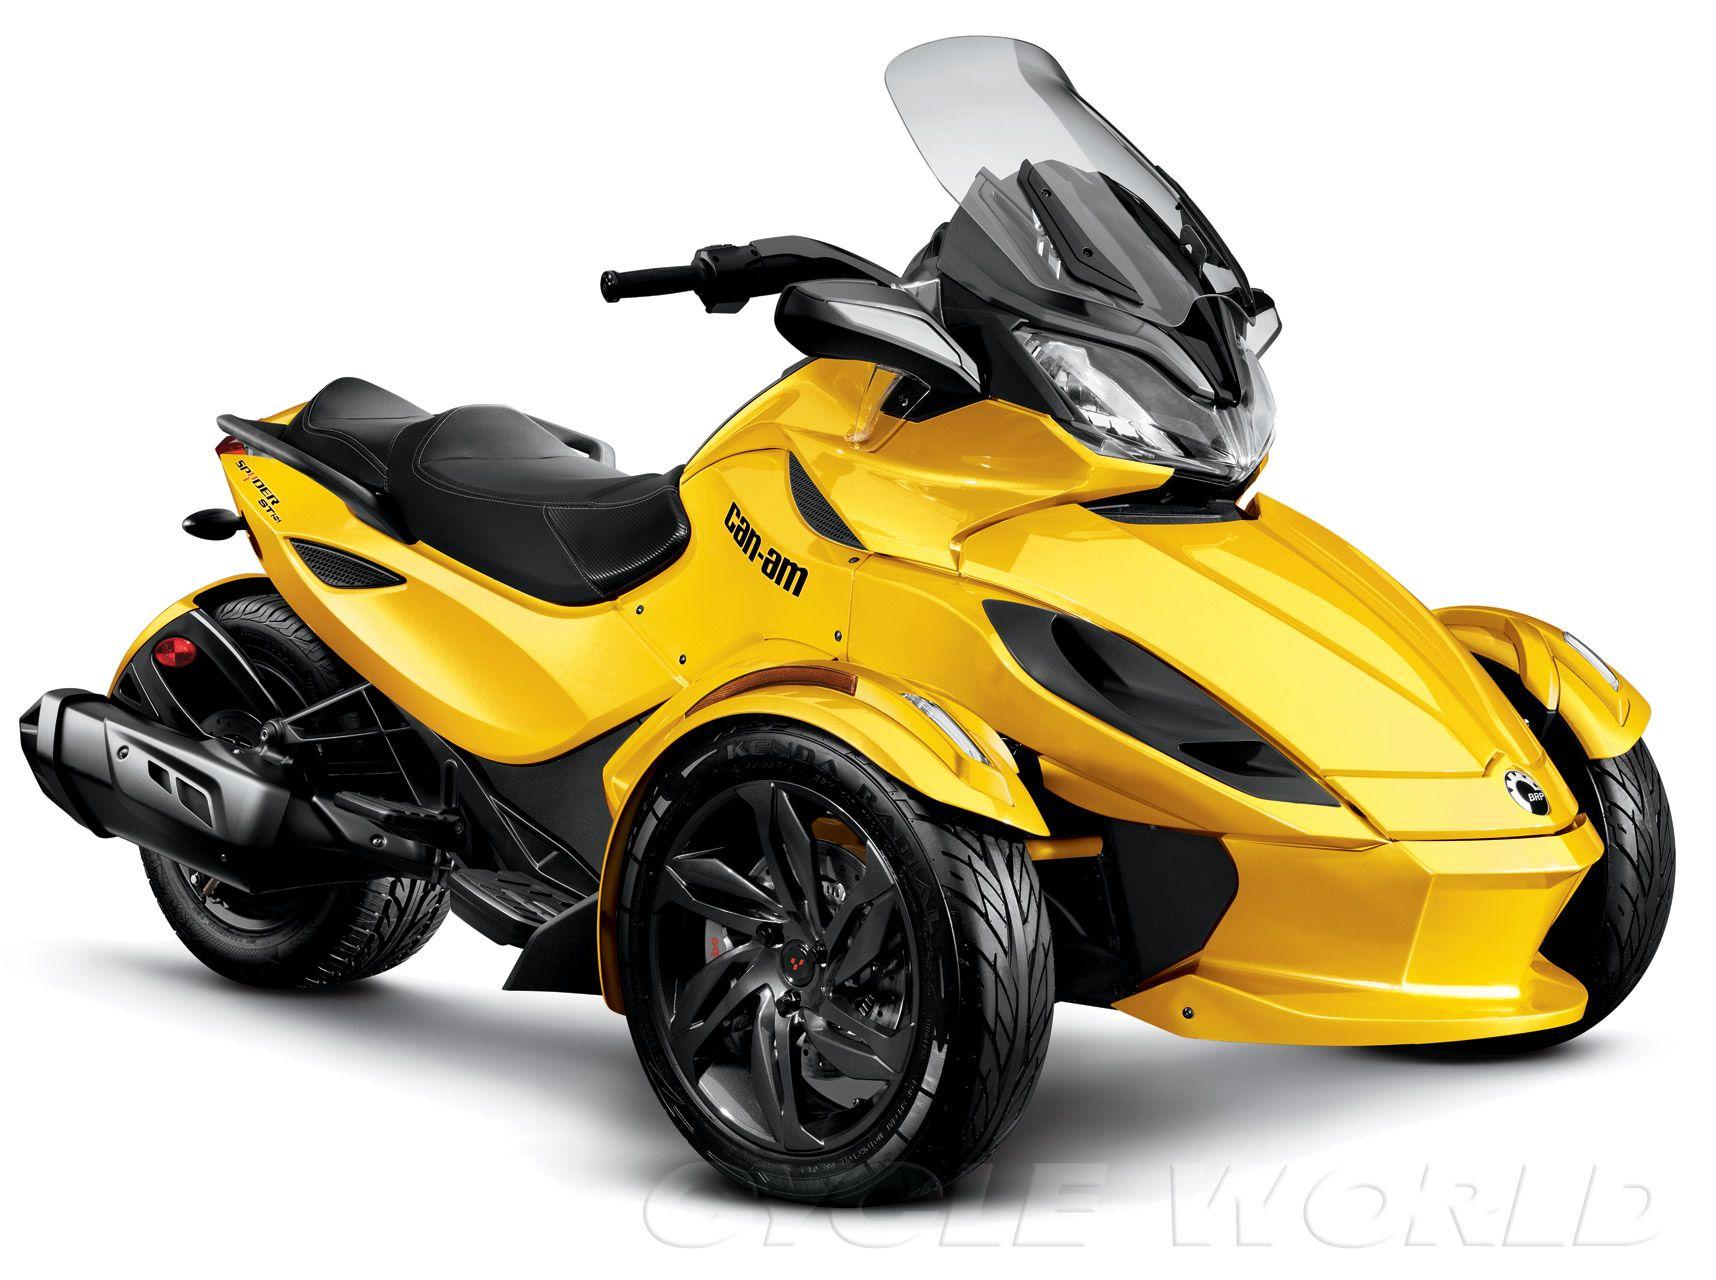 Can am spyder motorcycle saw a few at deal s gap can t imagine how they corner eatsleepride repins random eatsleepride posts pinterest cars